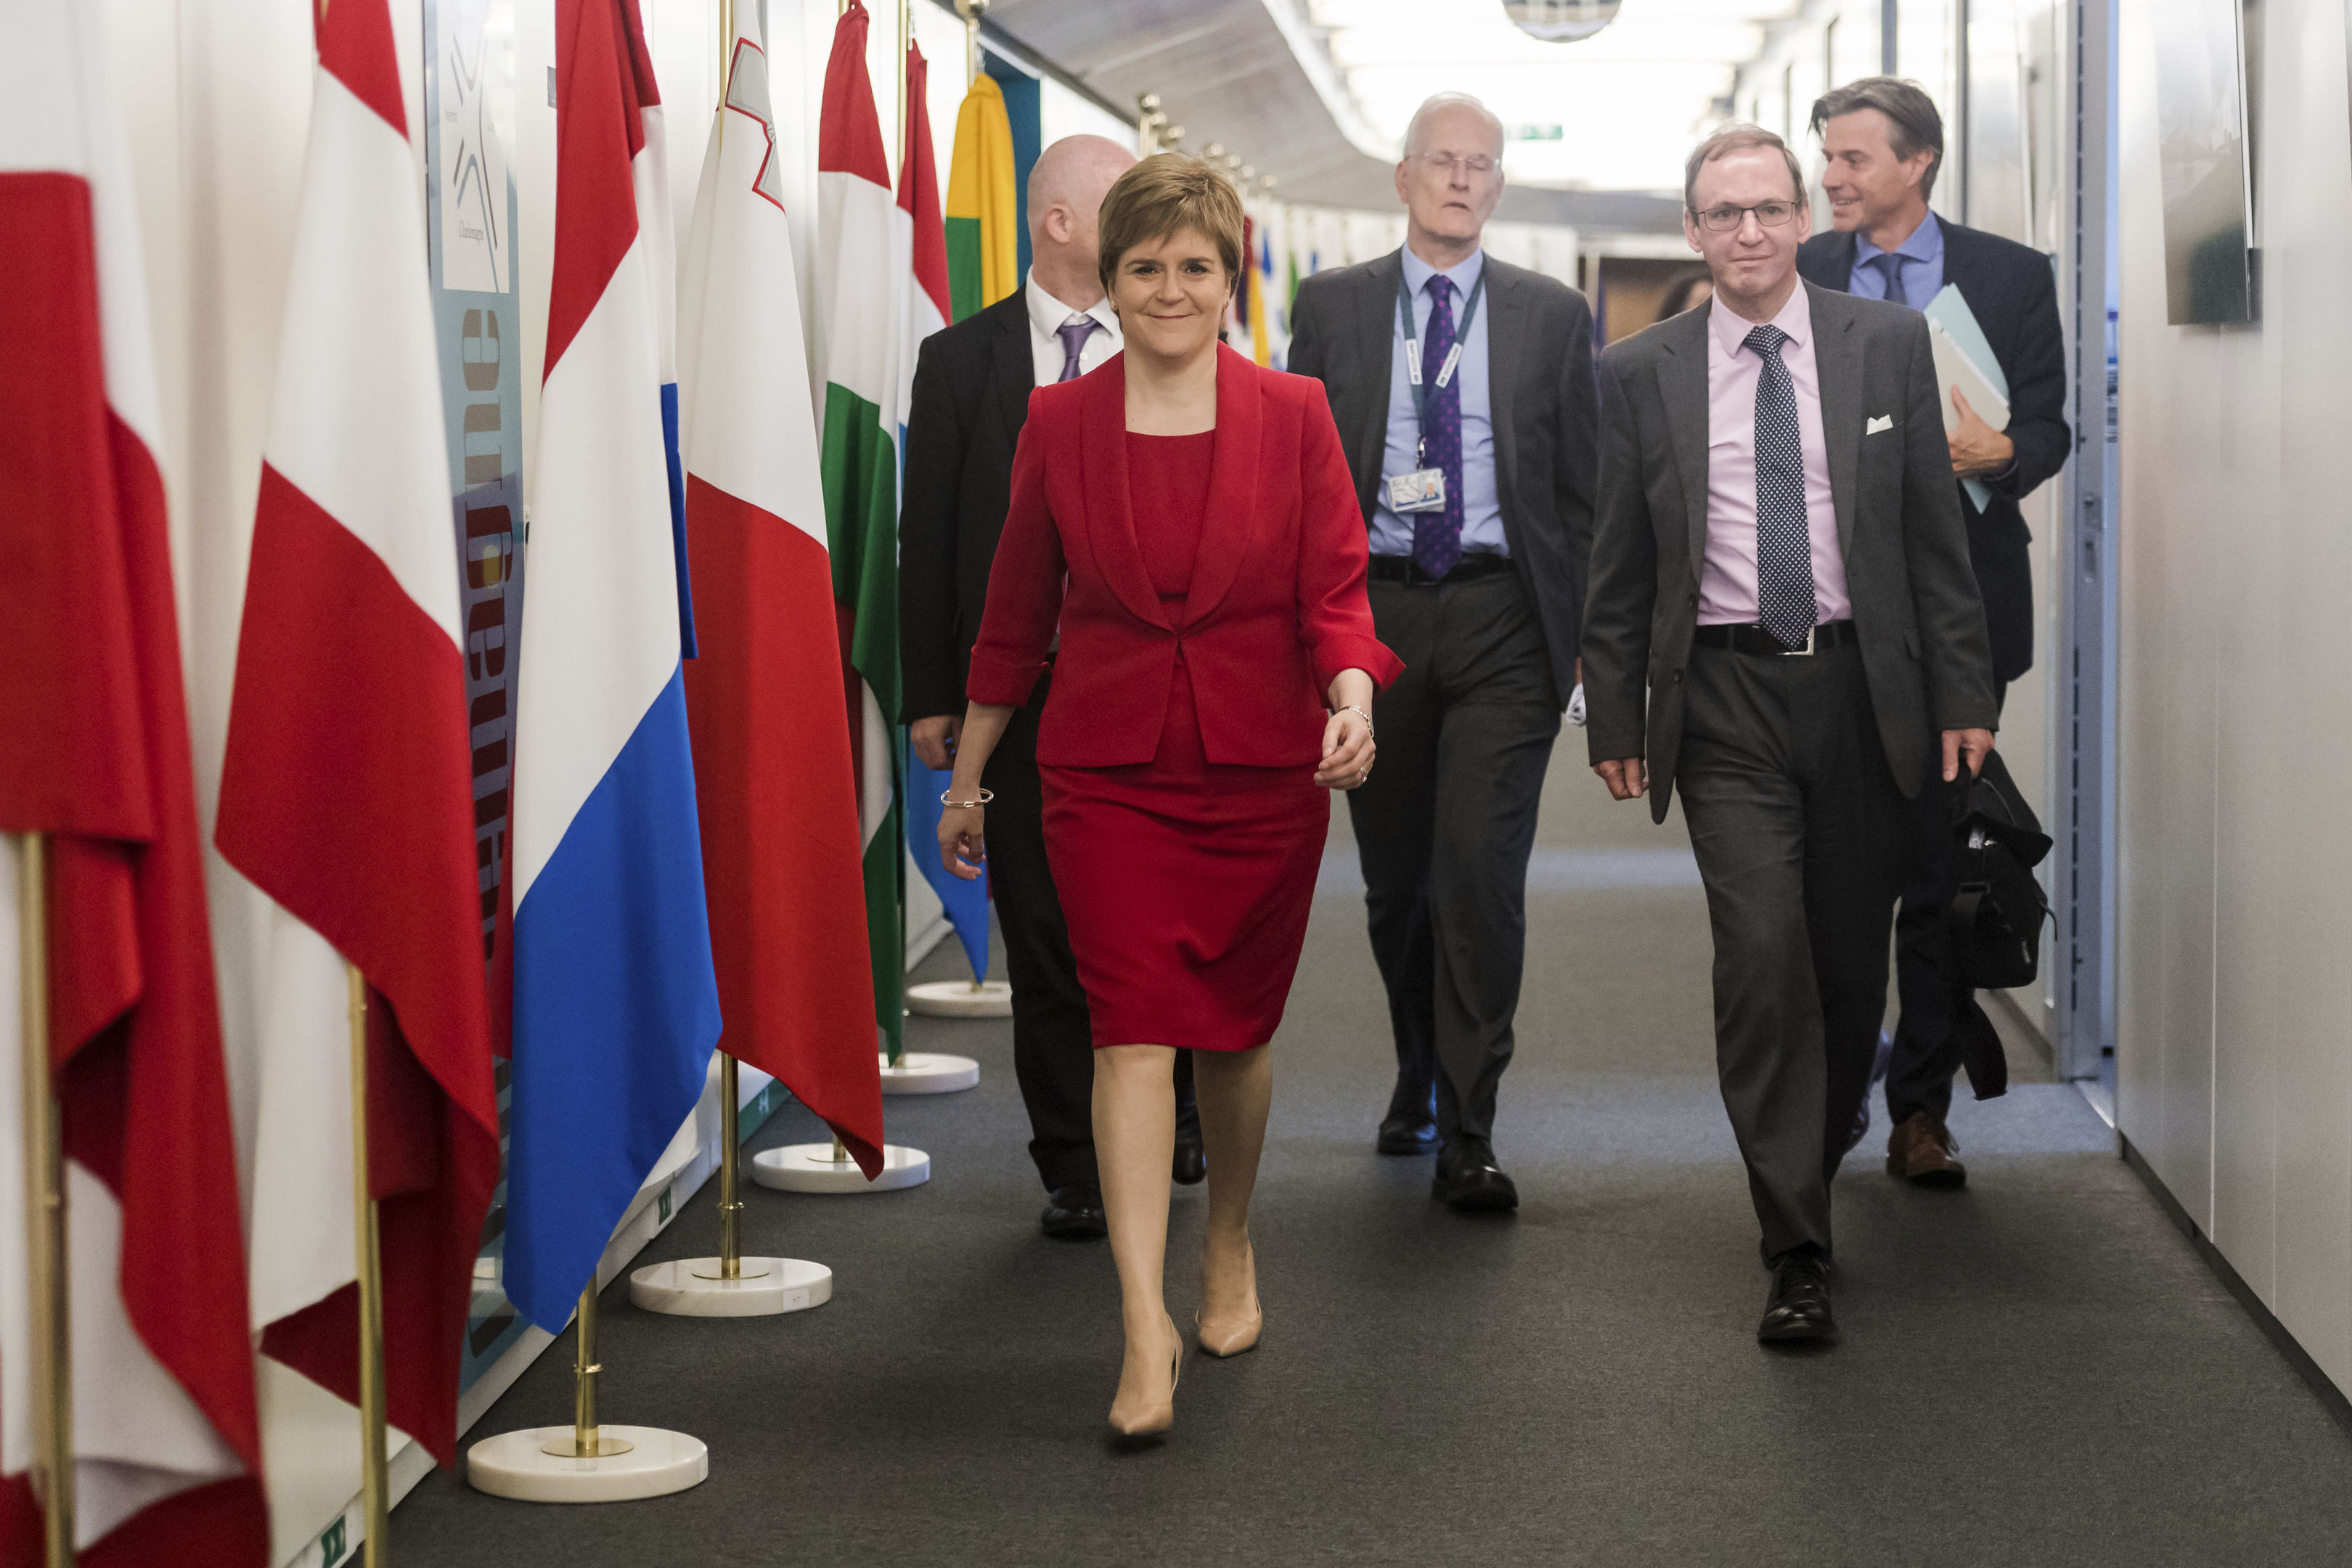 Scottish First Minister Nicola Sturgeon (AP Photo/Geert Vanden Wijngaert, Pool)